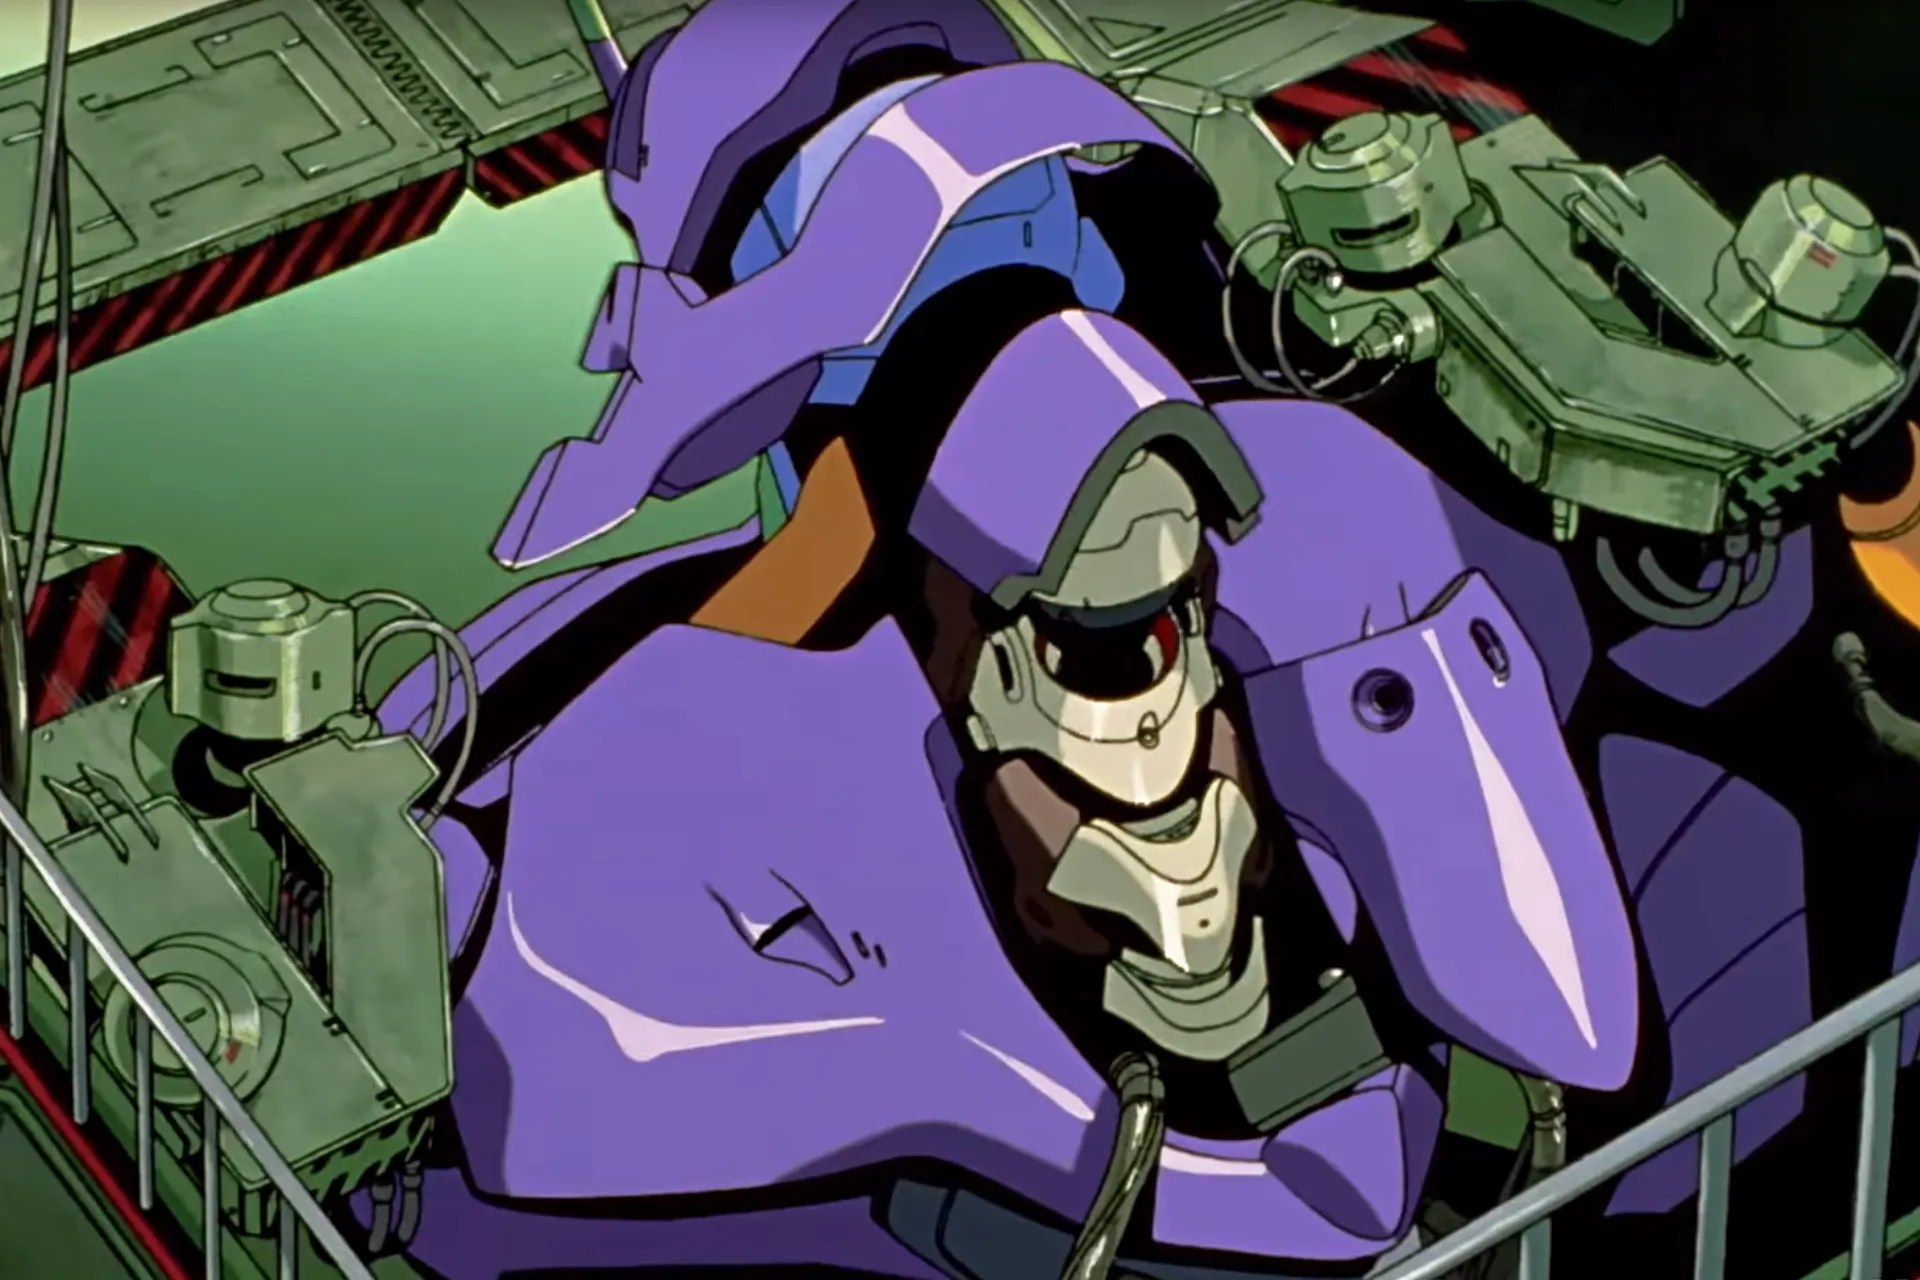 Eva Time Get In The Fucking Robot Shinji Know Your Meme